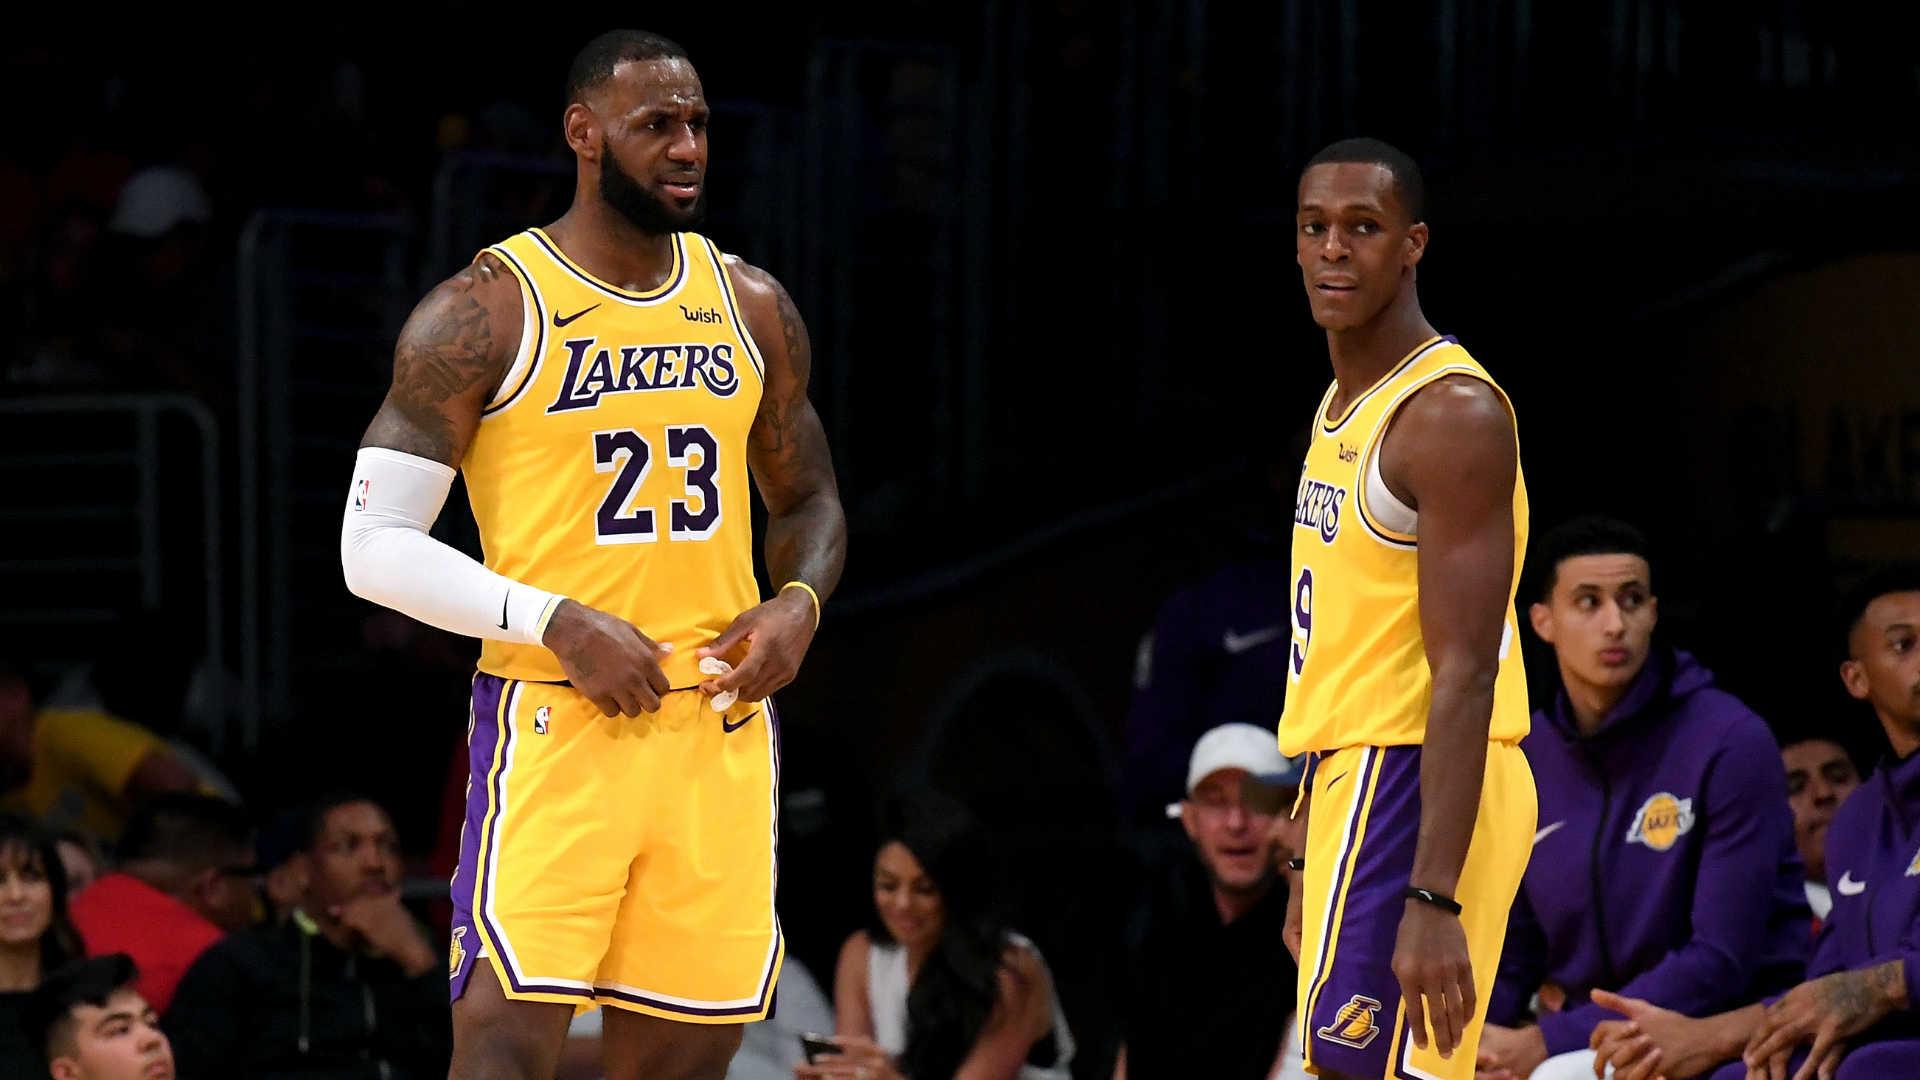 Lakers injury updates: Rajon Rondo expected back Thursday, LeBron James continues rehab